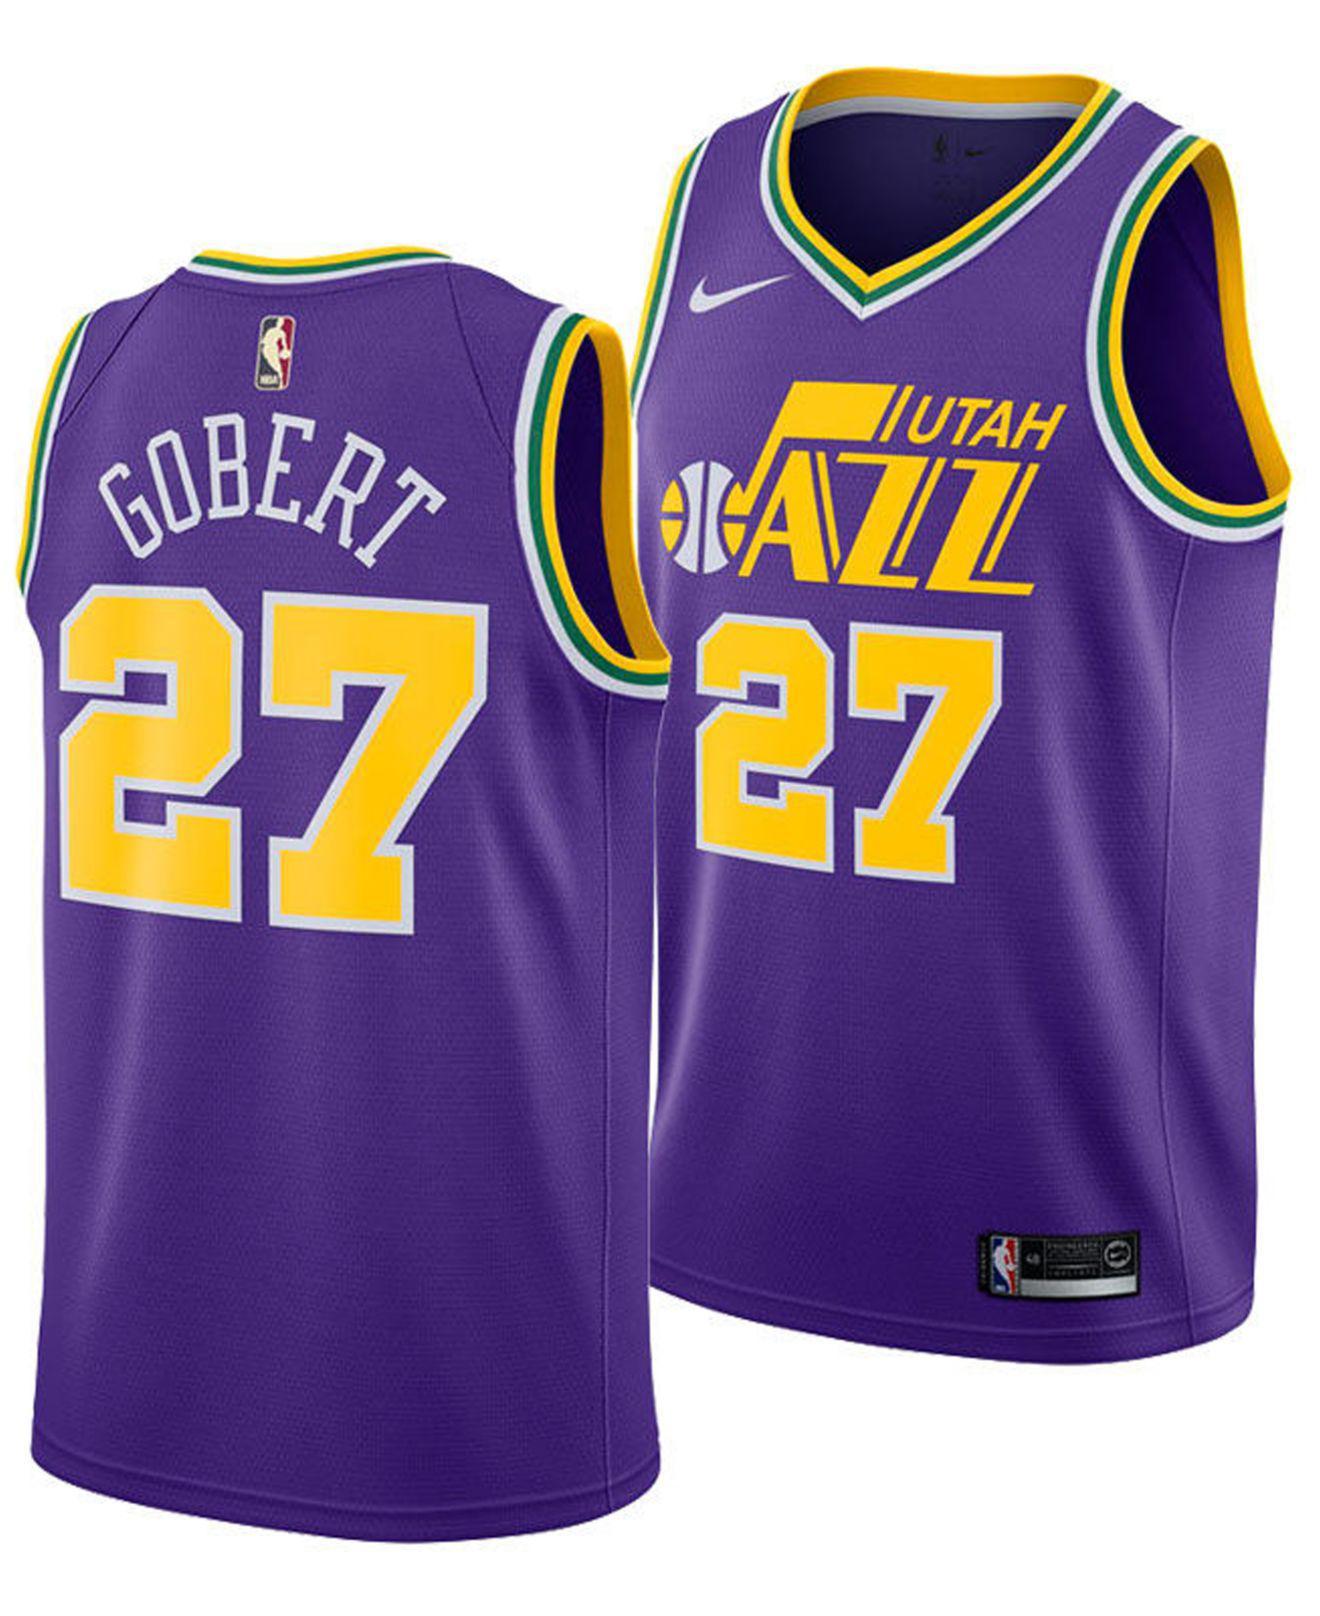 75d8d1c6f Lyst - Nike Rudy Gobert Utah Jazz Hardwood Classic Swingman Jersey ...